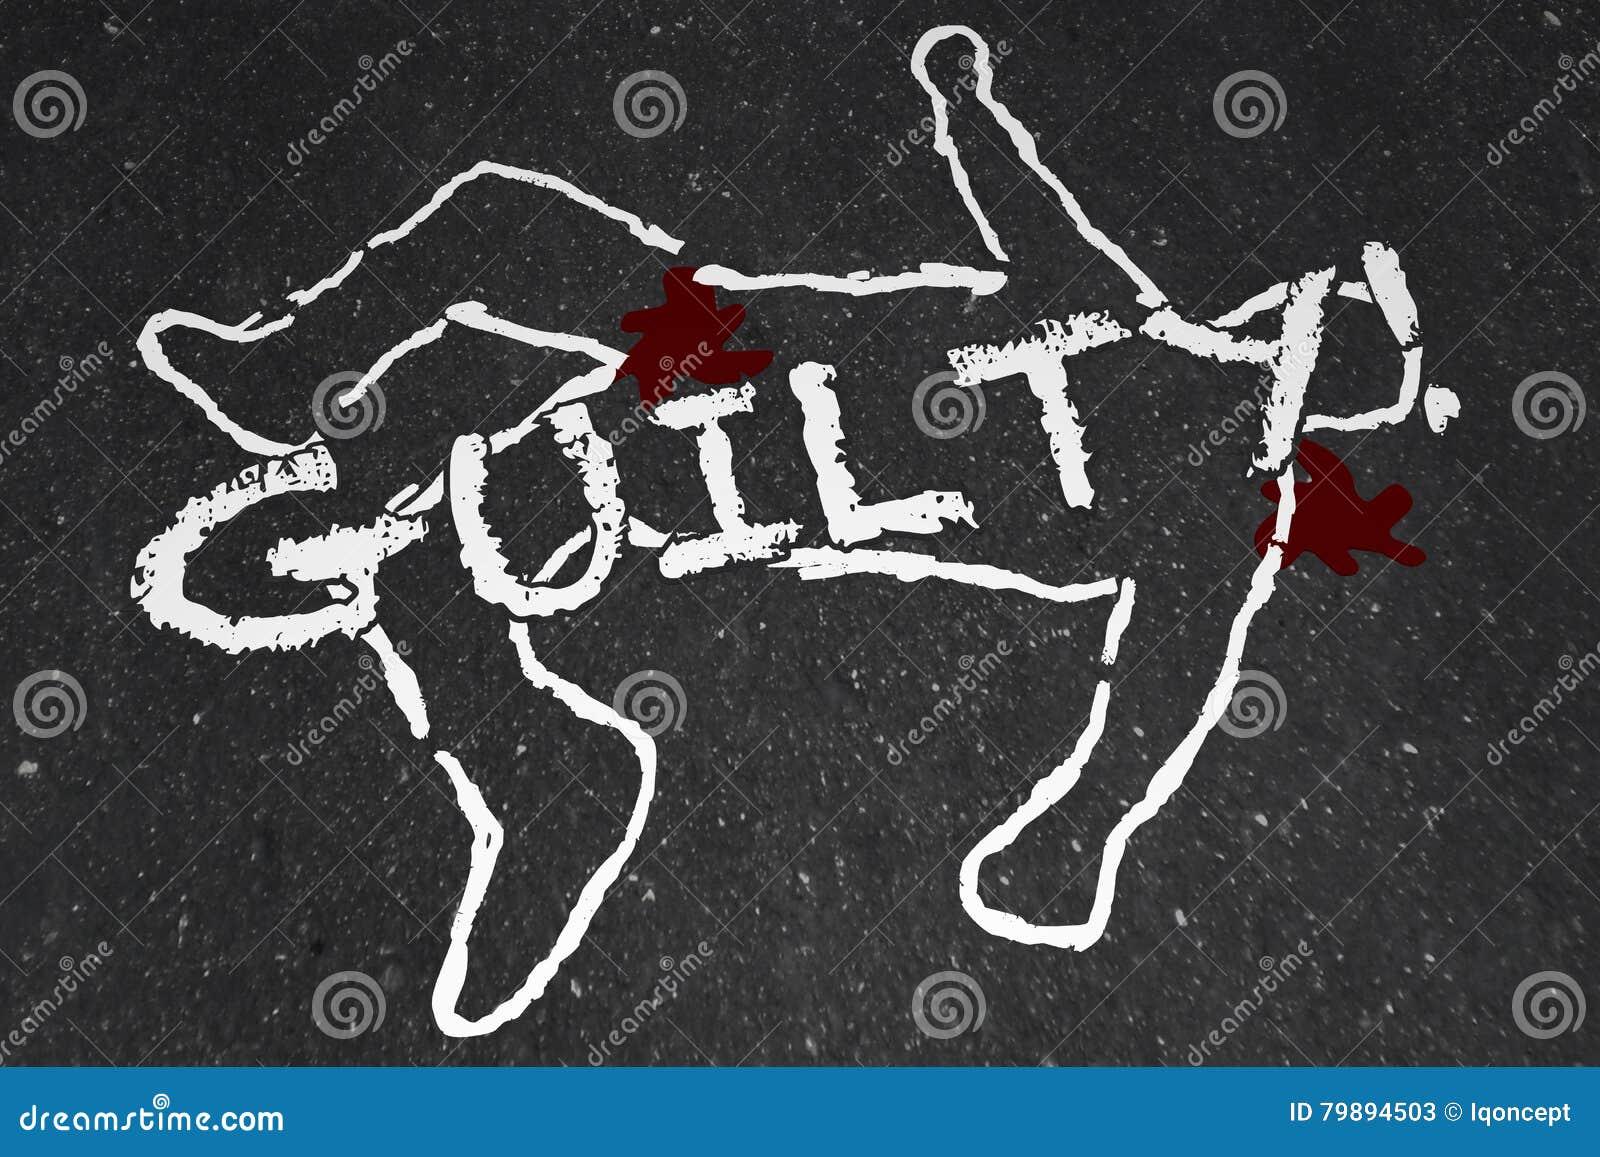 Guilty Crime Suspect Dead Body Murder Chalk Outline